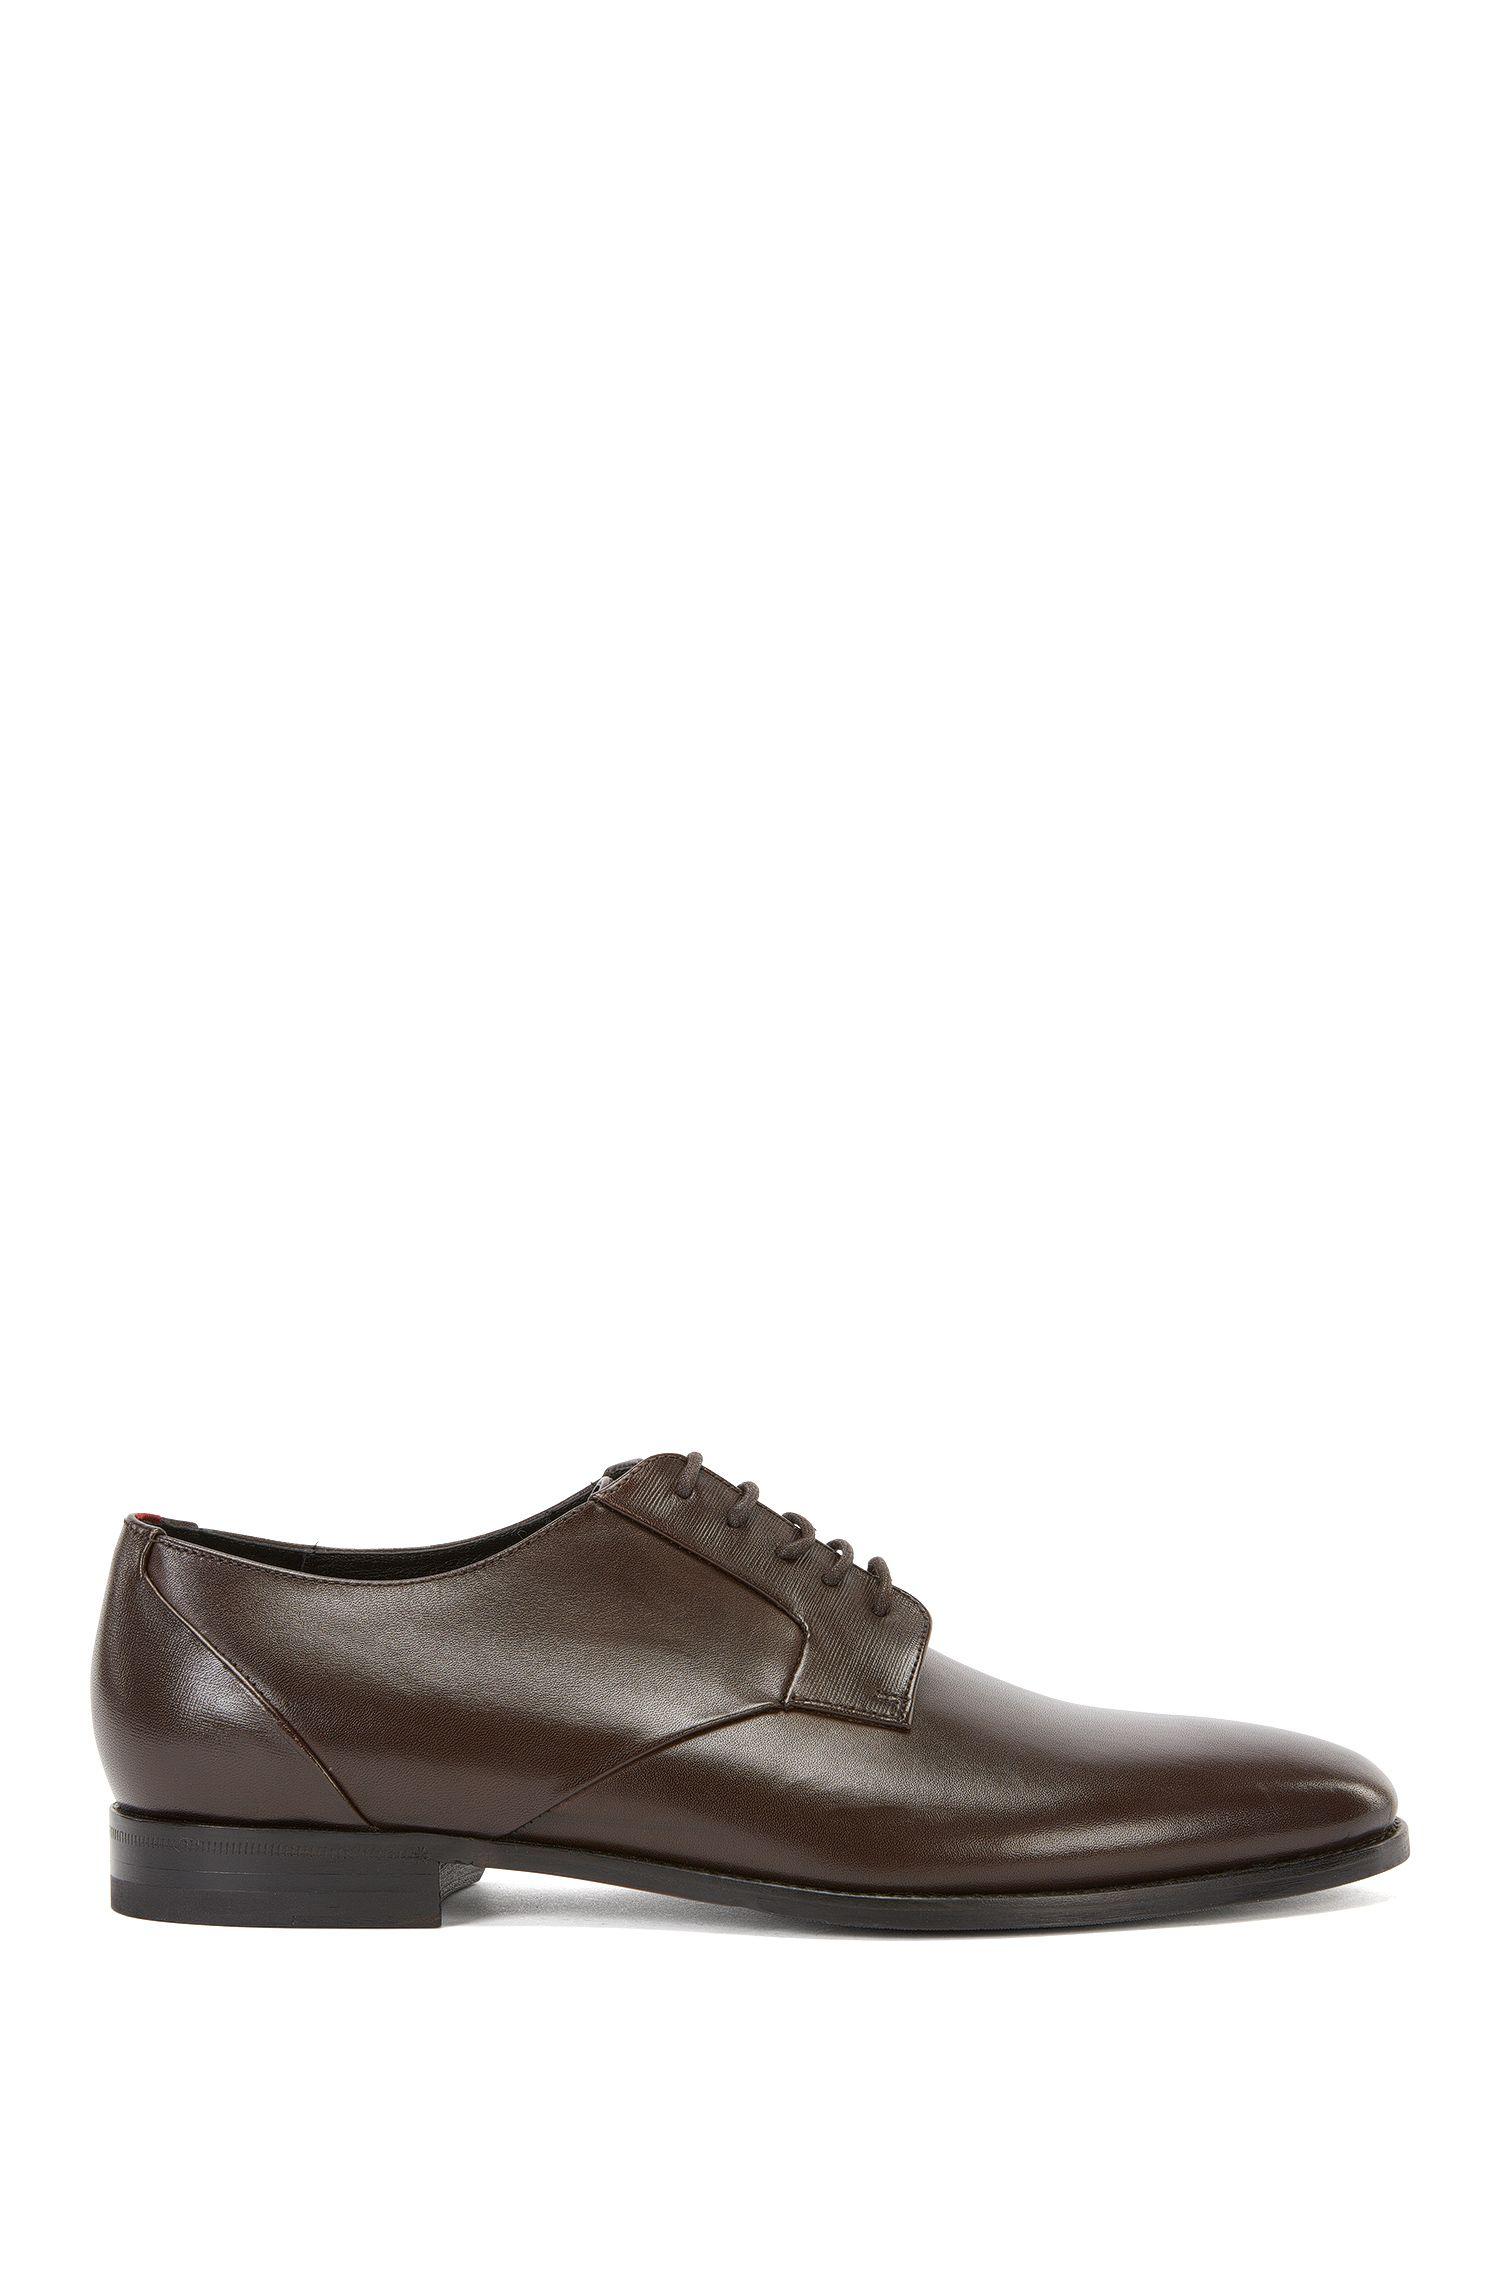 Chaussures derby lacées en cuir poli